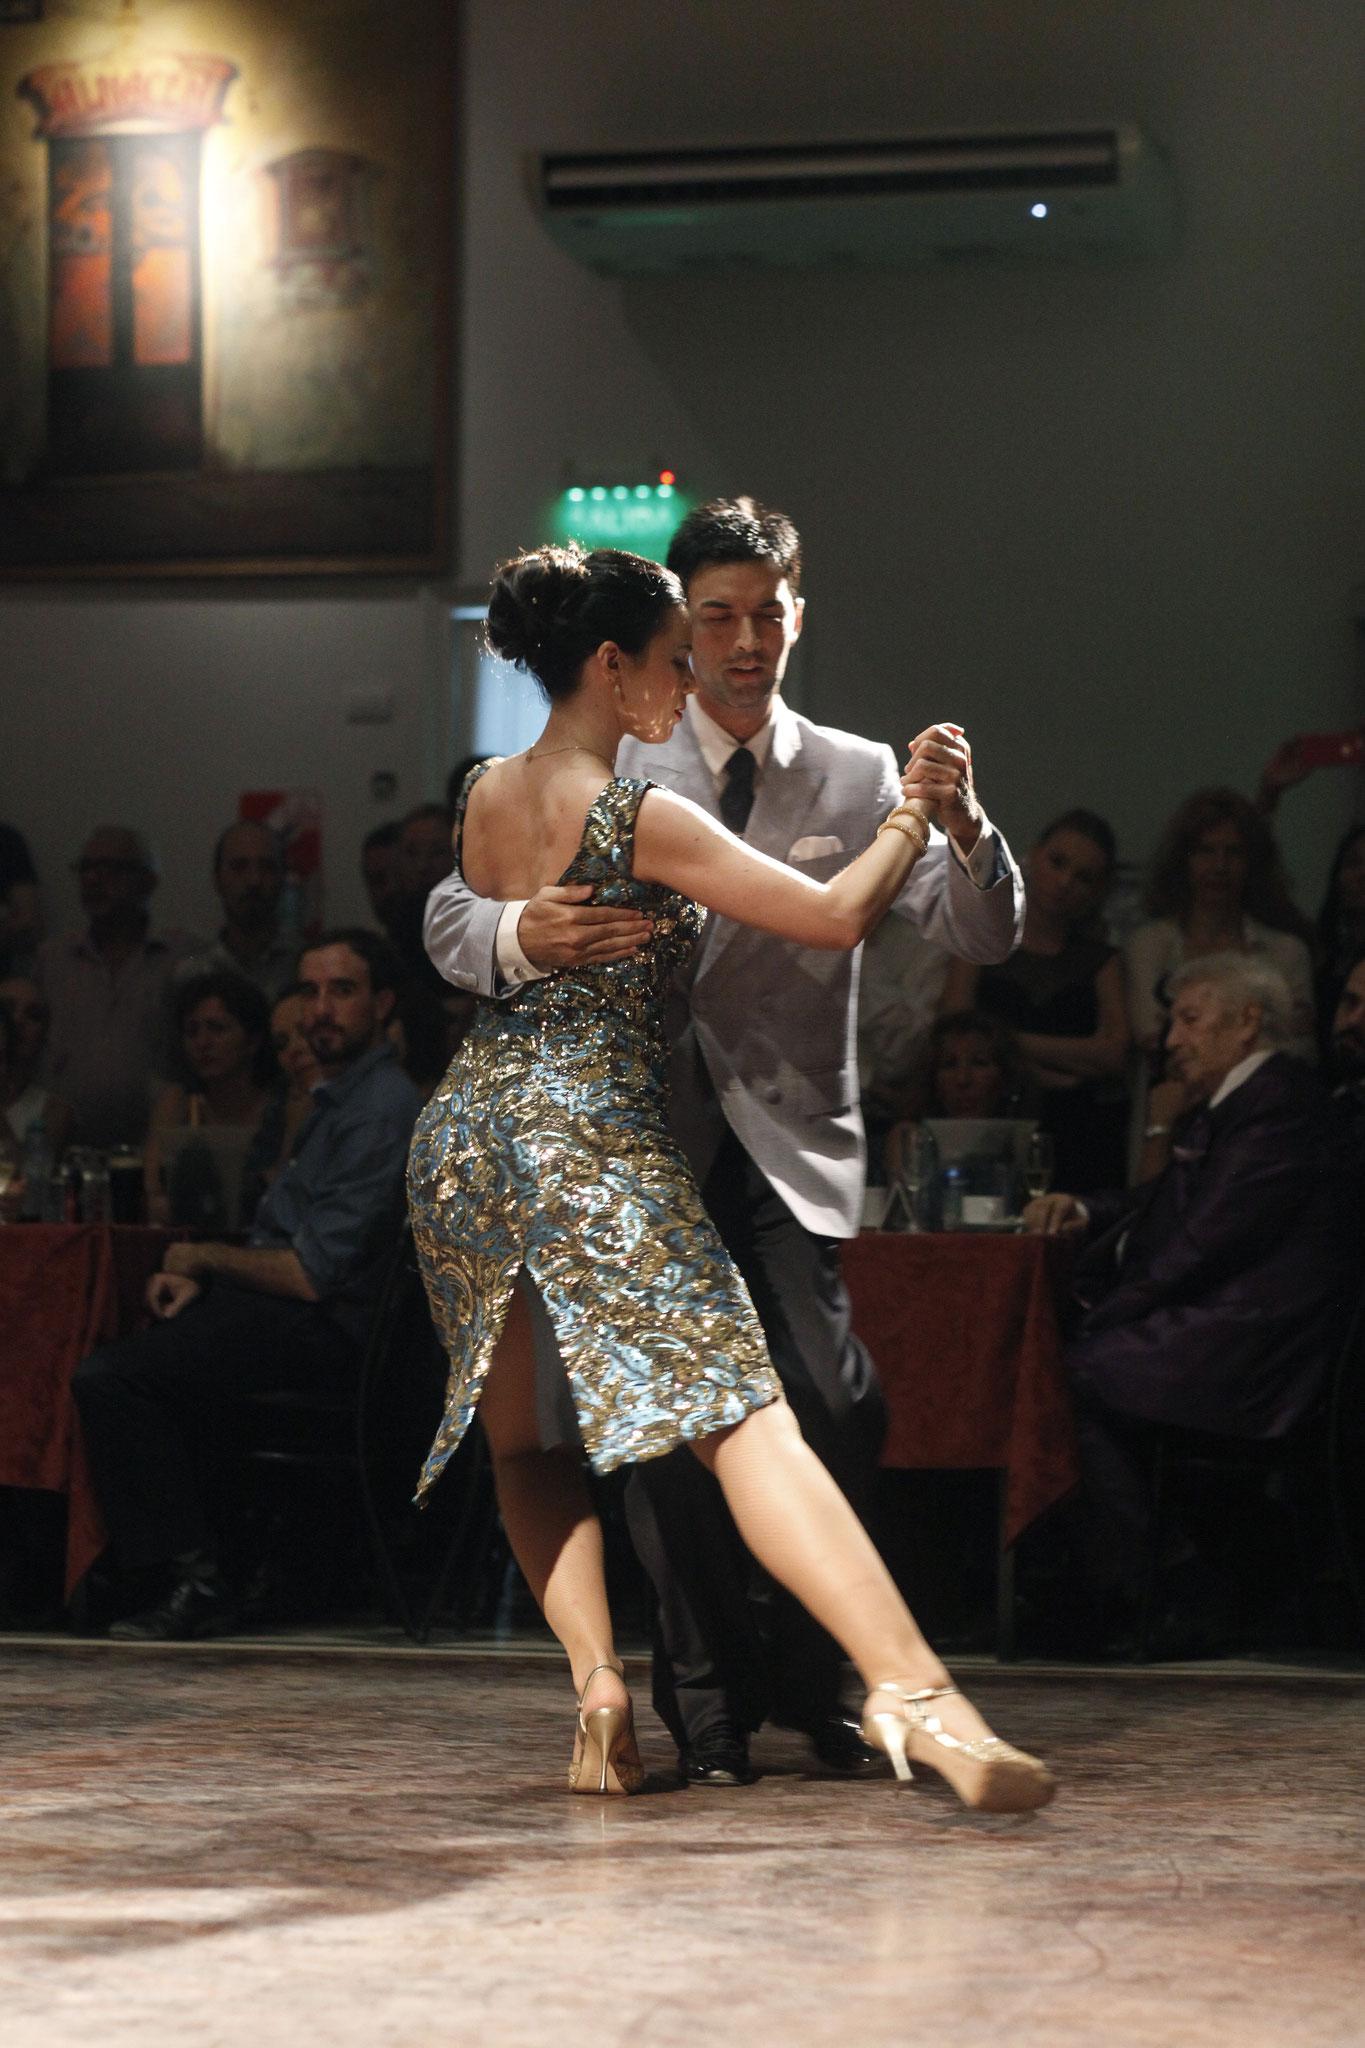 Salón Canning - Buenos Aires